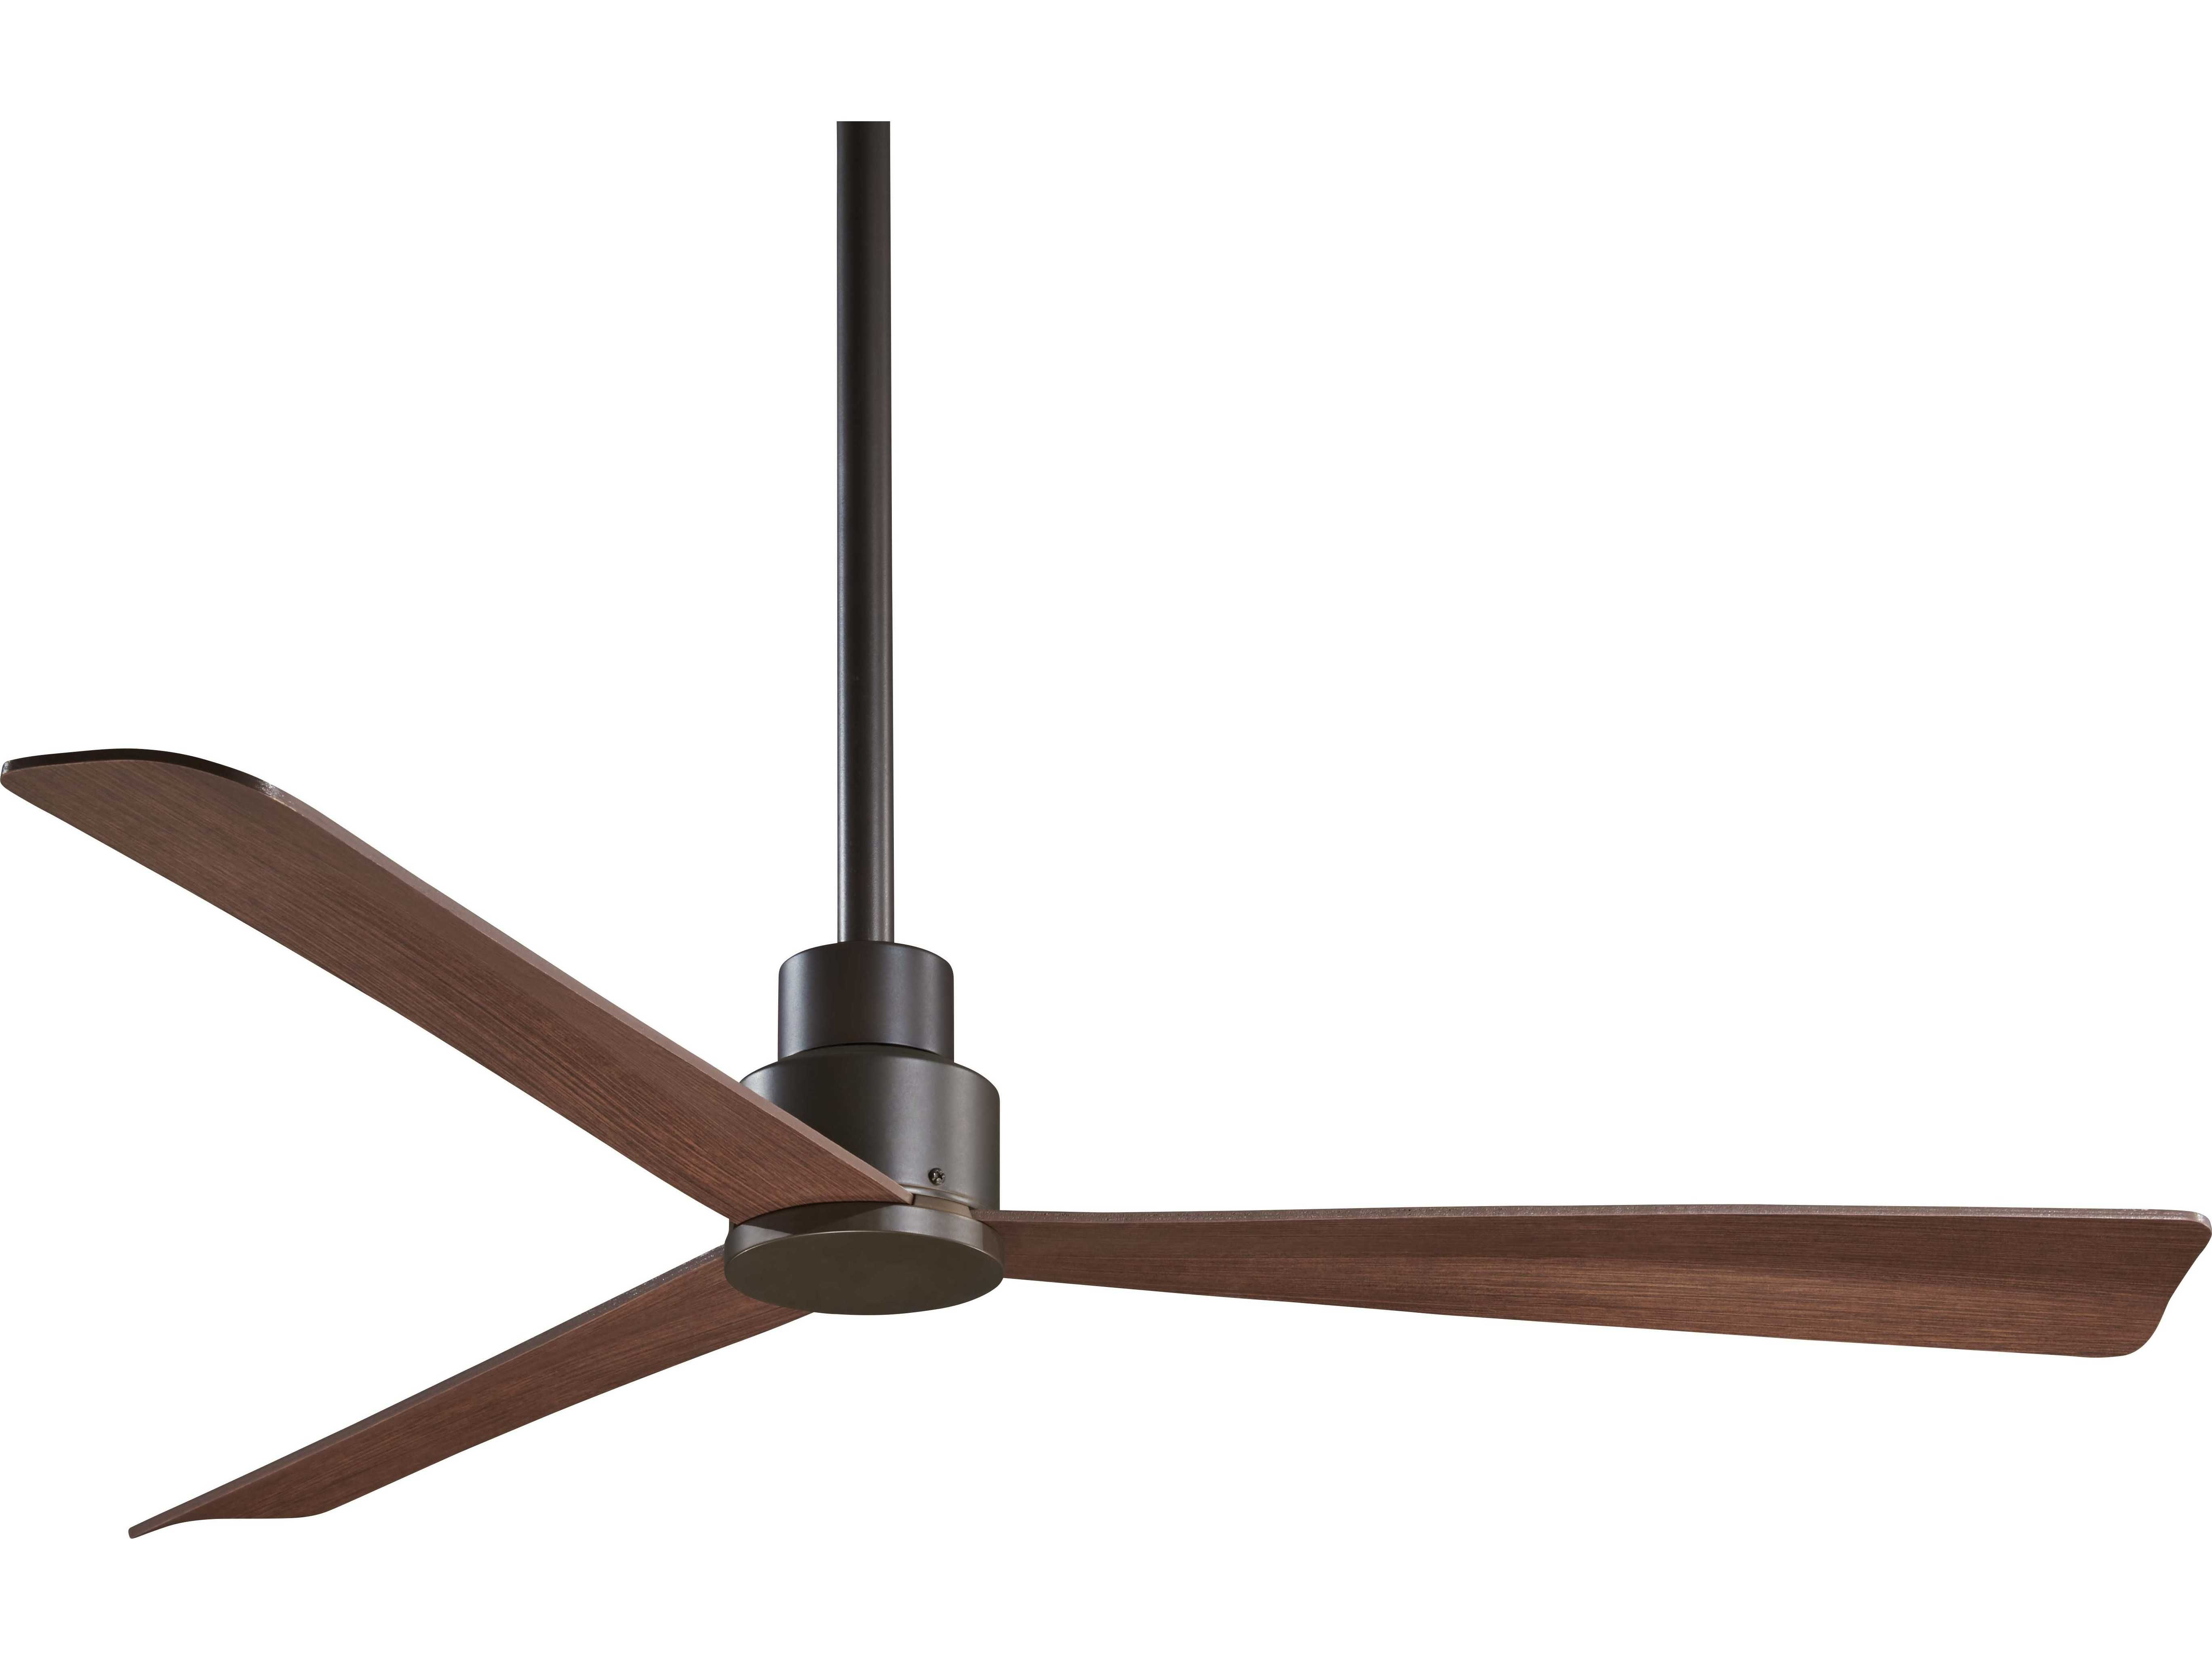 Minka Aire Simple Oil Rubbed Bronze 52 Wide Outdoor Ceiling Fan Ceiling Fan Outdoor Ceiling Fans Modern Ceiling Fan